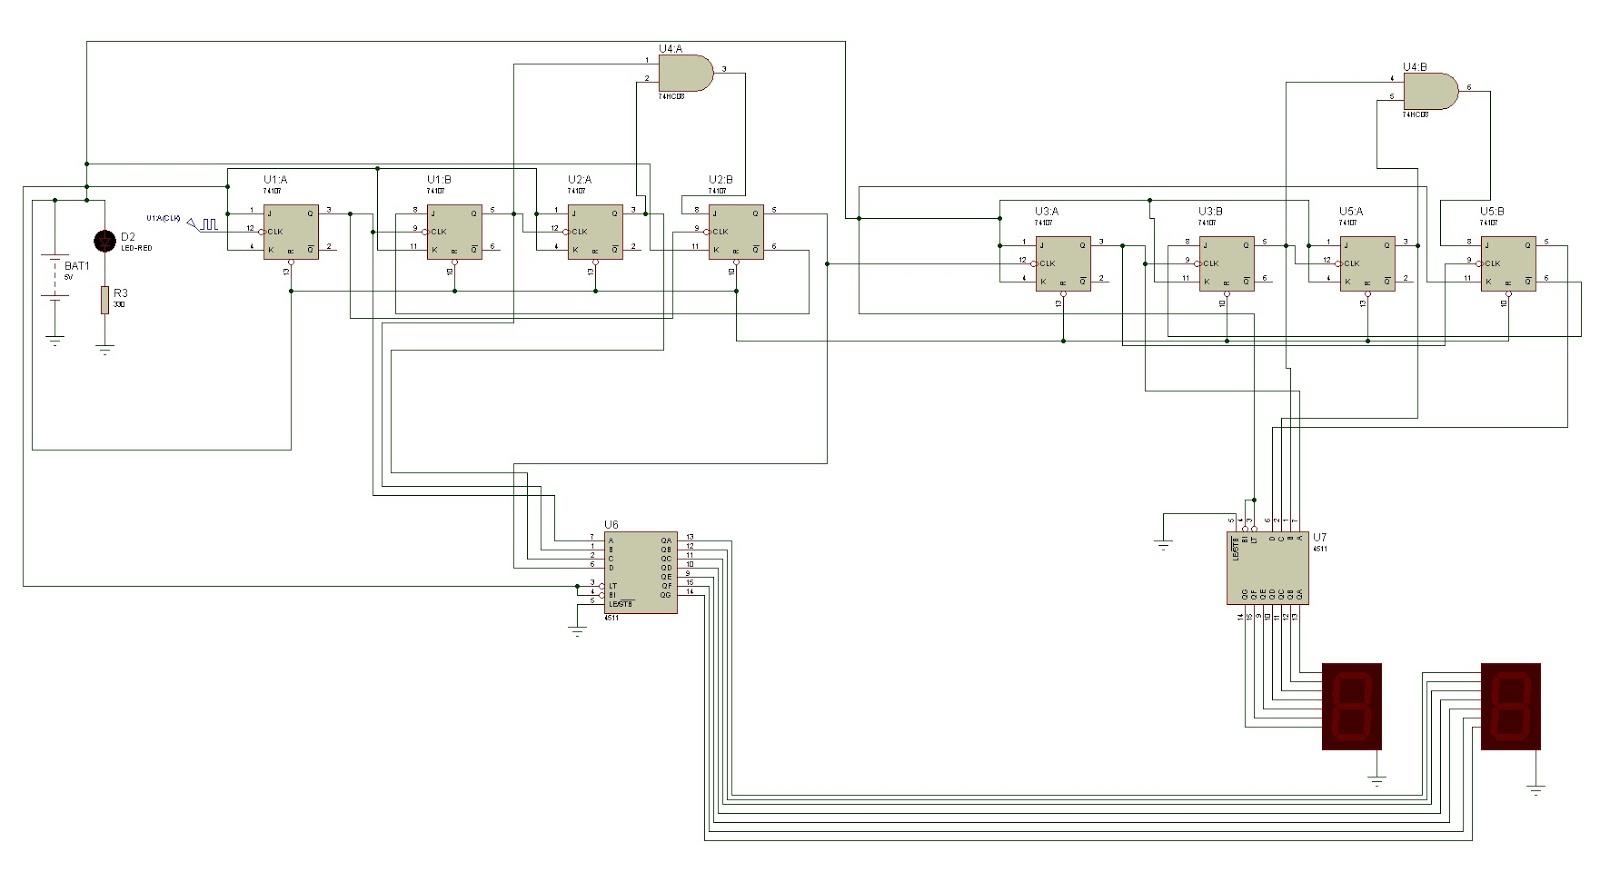 0 99 counter circuit with jk flip flop [ 1600 x 882 Pixel ]